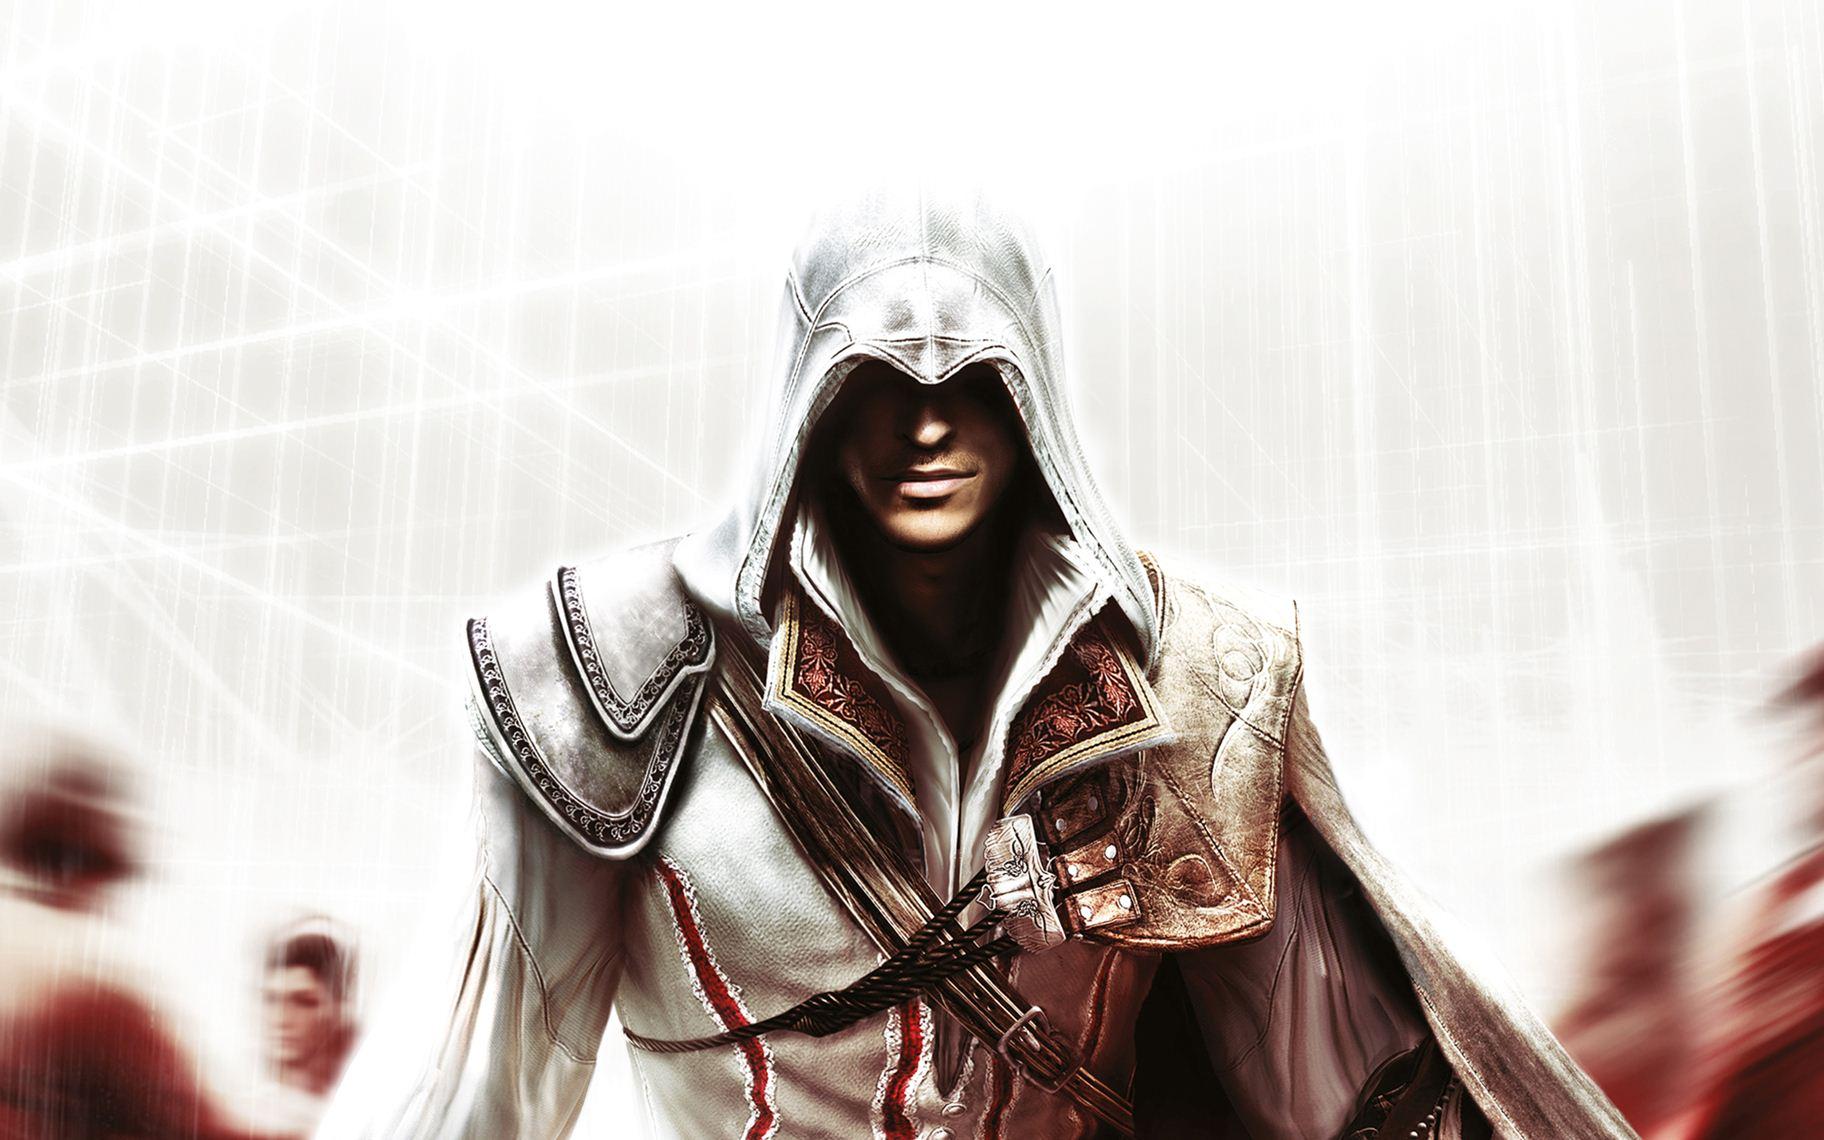 Assassins Creed Screensaver